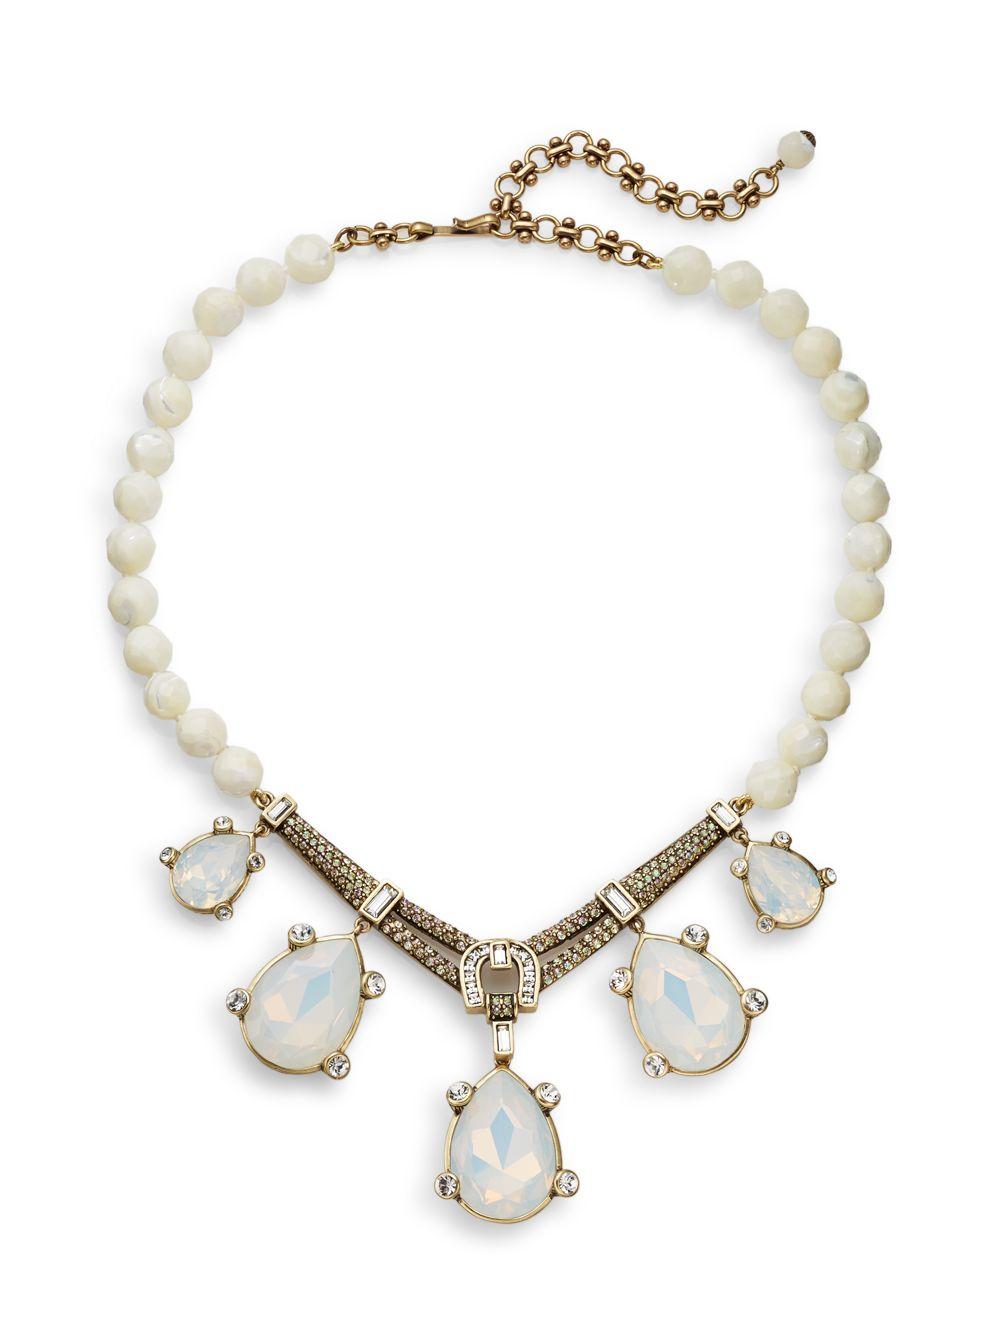 6425b267c0320 Heidi Daus St. Bart's Rocks Teardrop Necklace in Metallic - Lyst